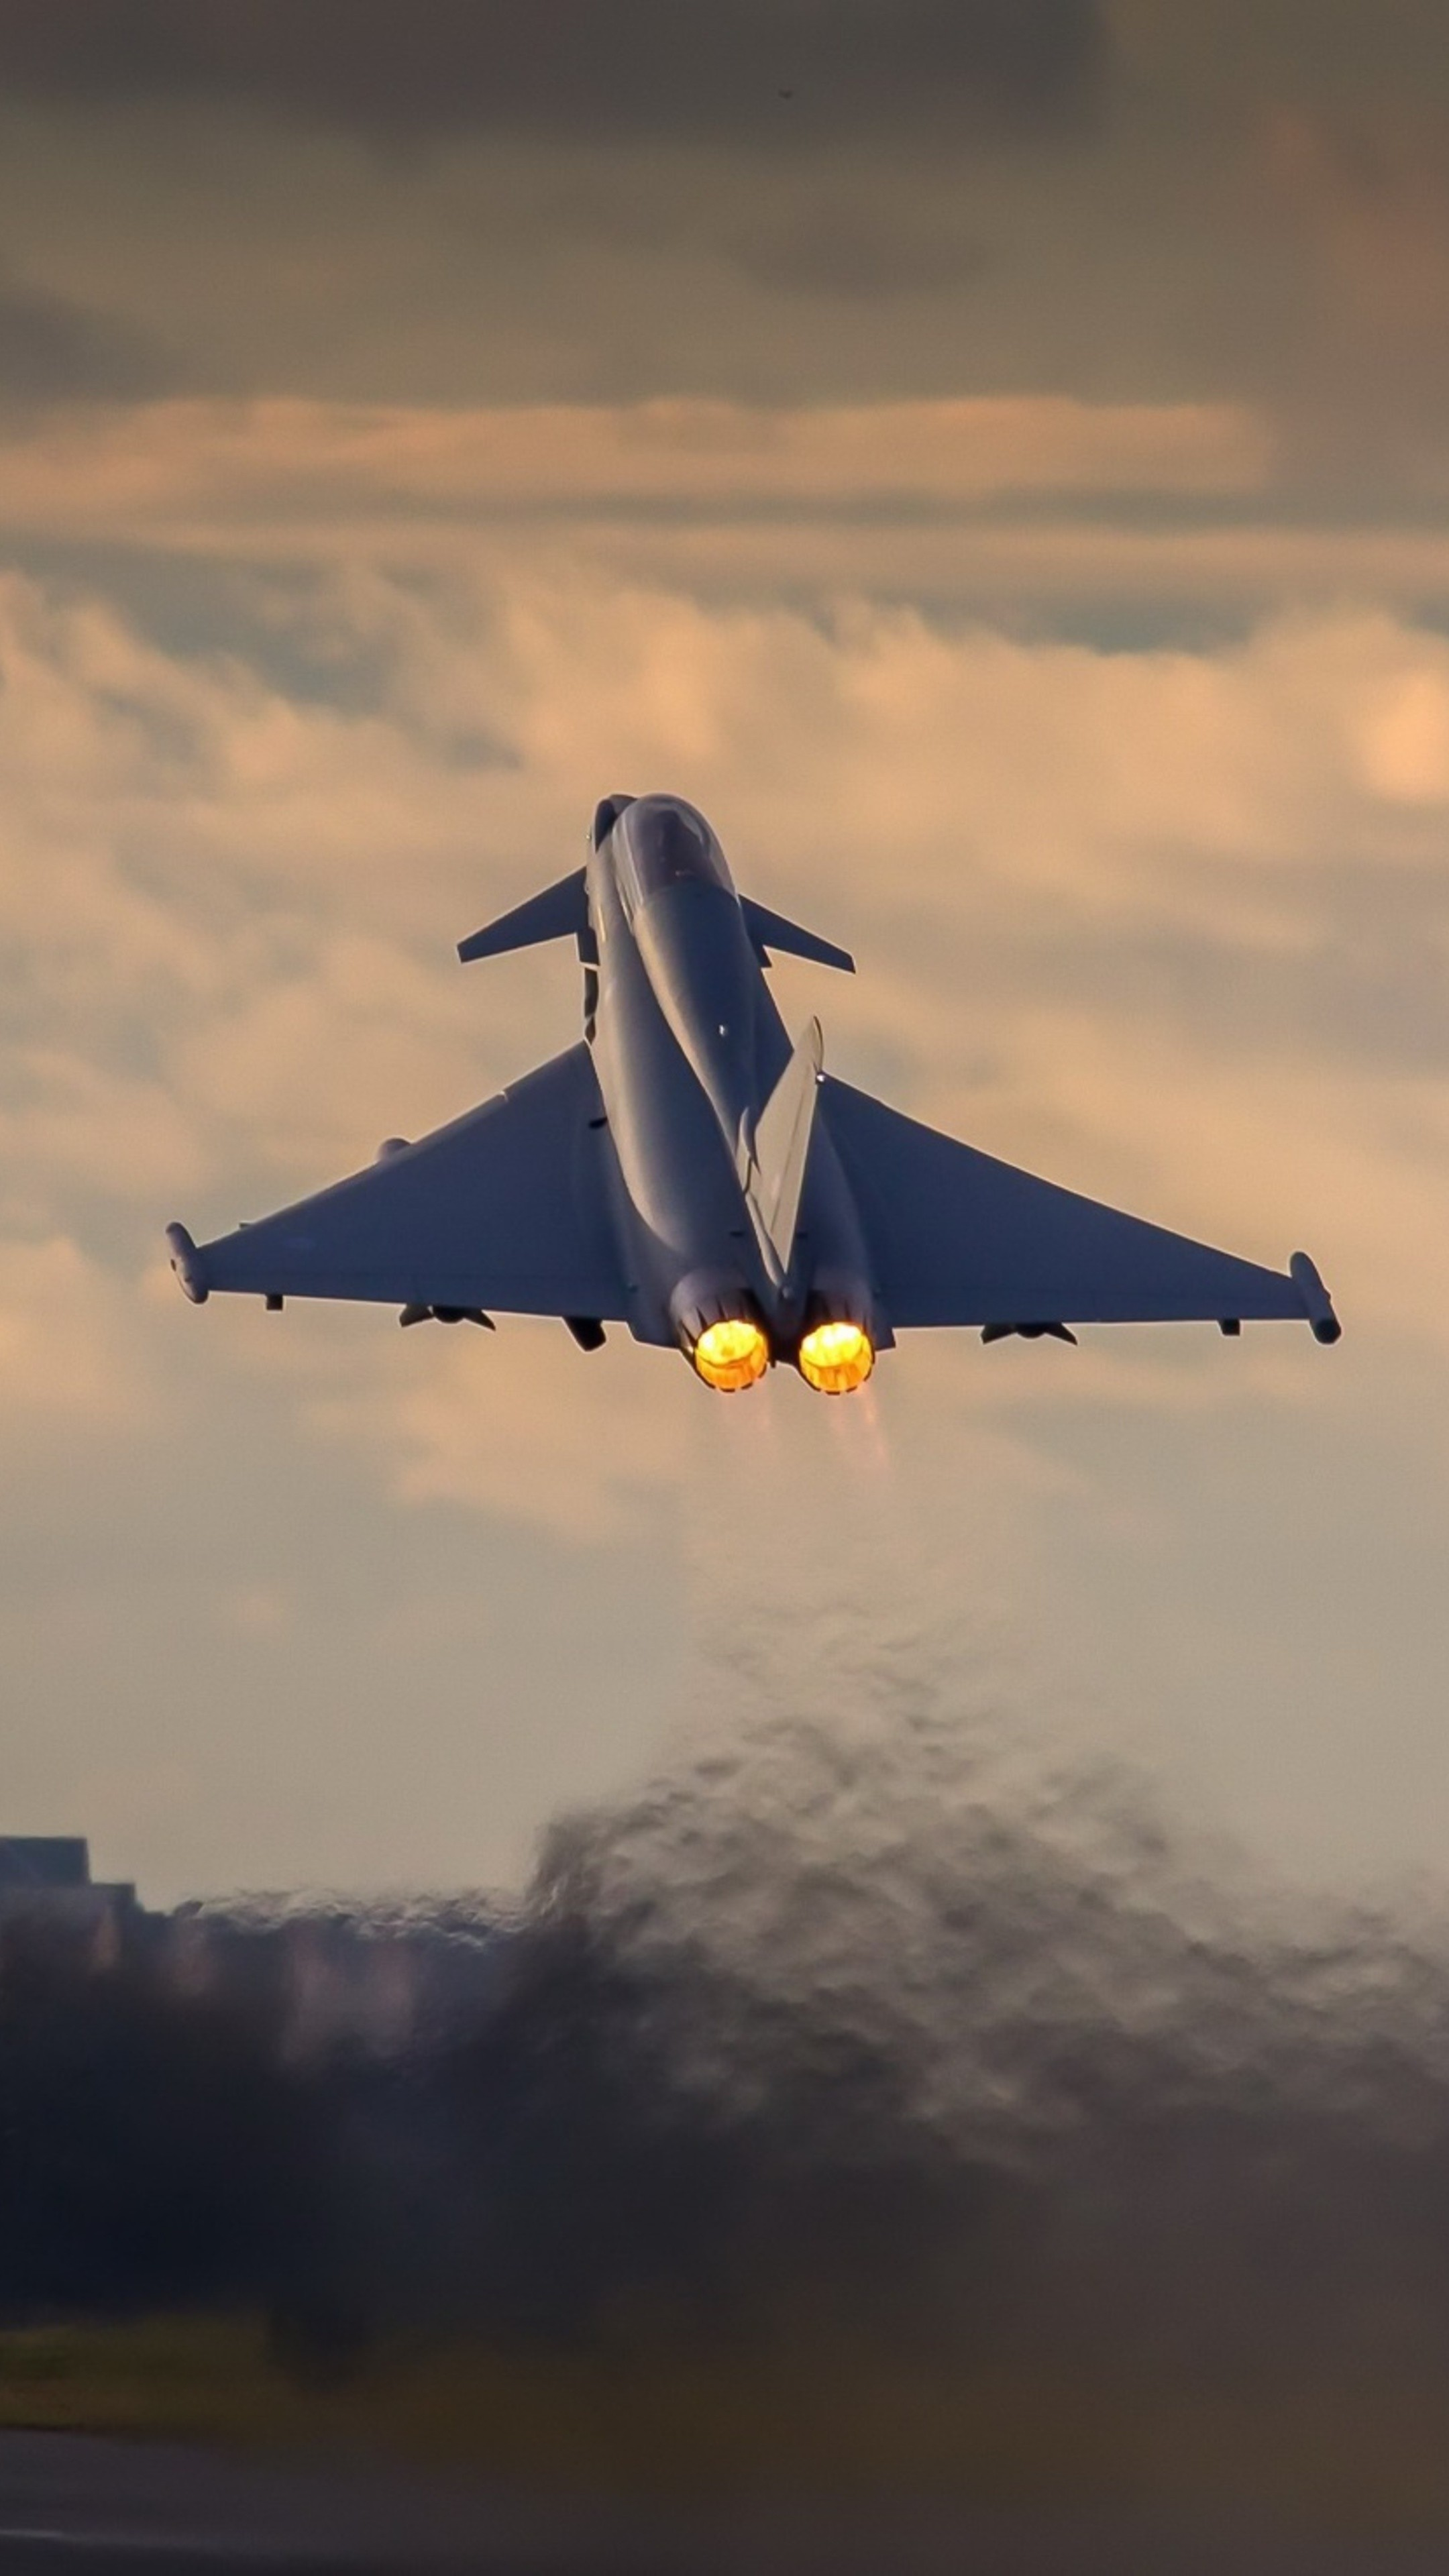 Islamic Wallpaper Hd 3d Eurofighter Typhoon Hd 8r Wallpaper 2160x3840